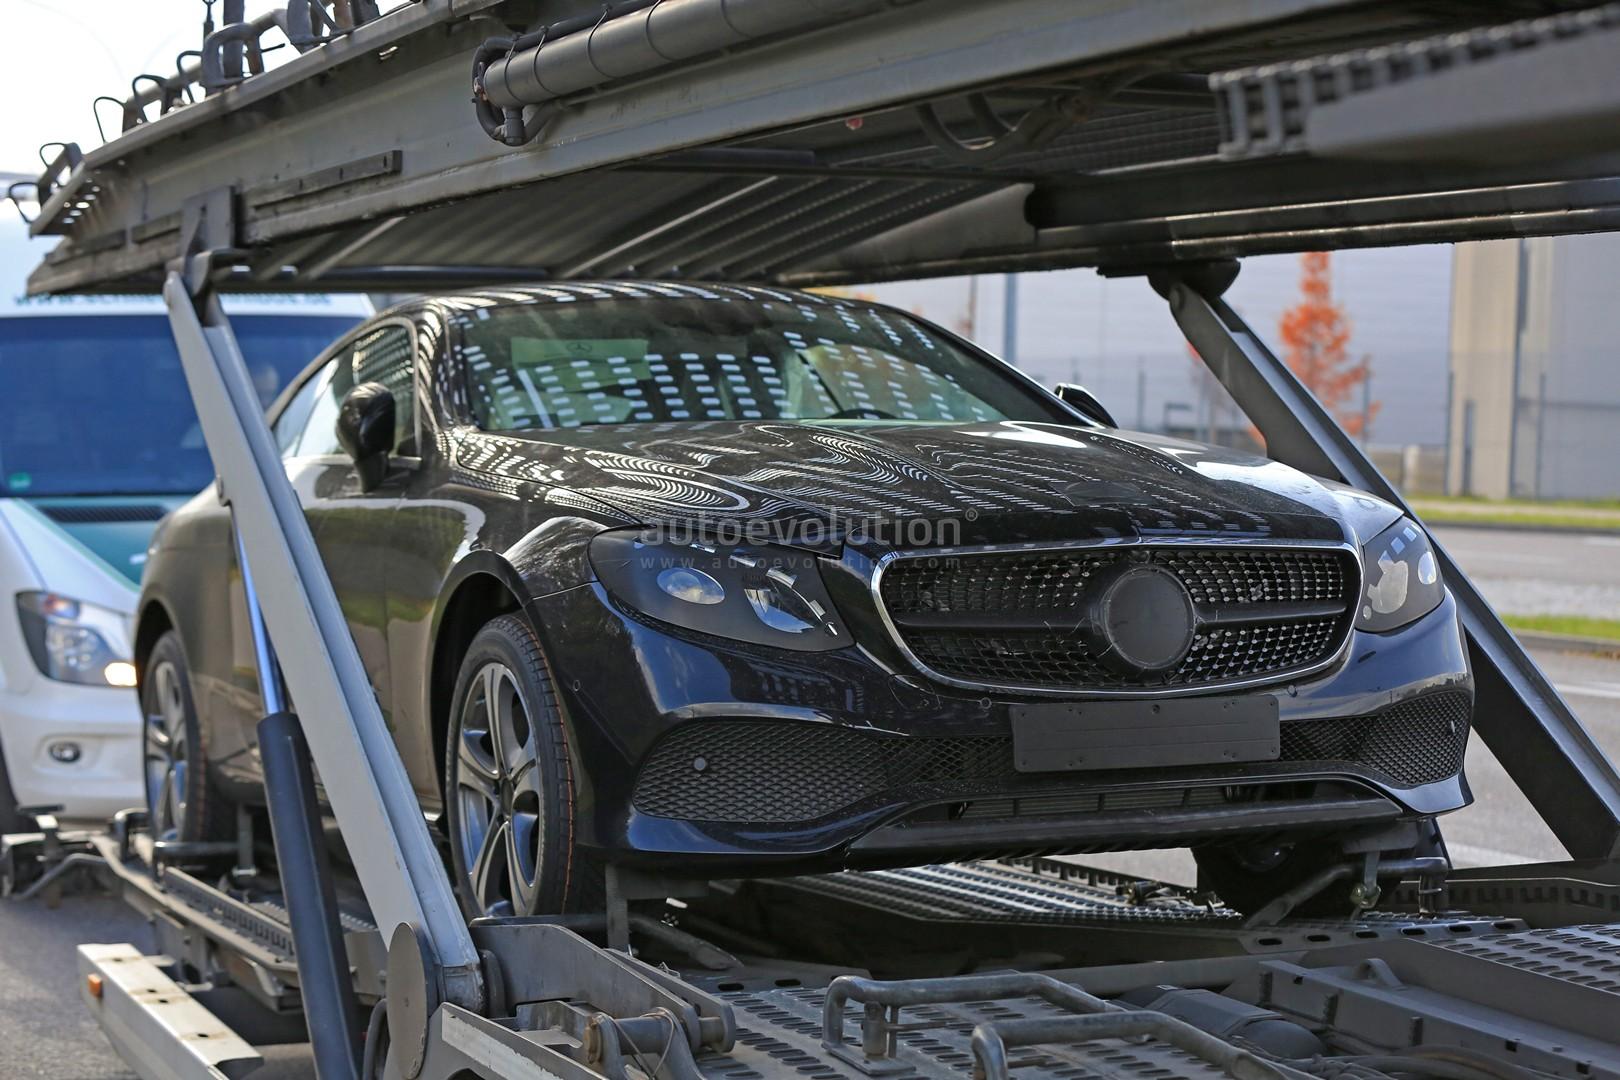 Mercedes-Benz recalls S-Class, GLE to fix misaligned headlights